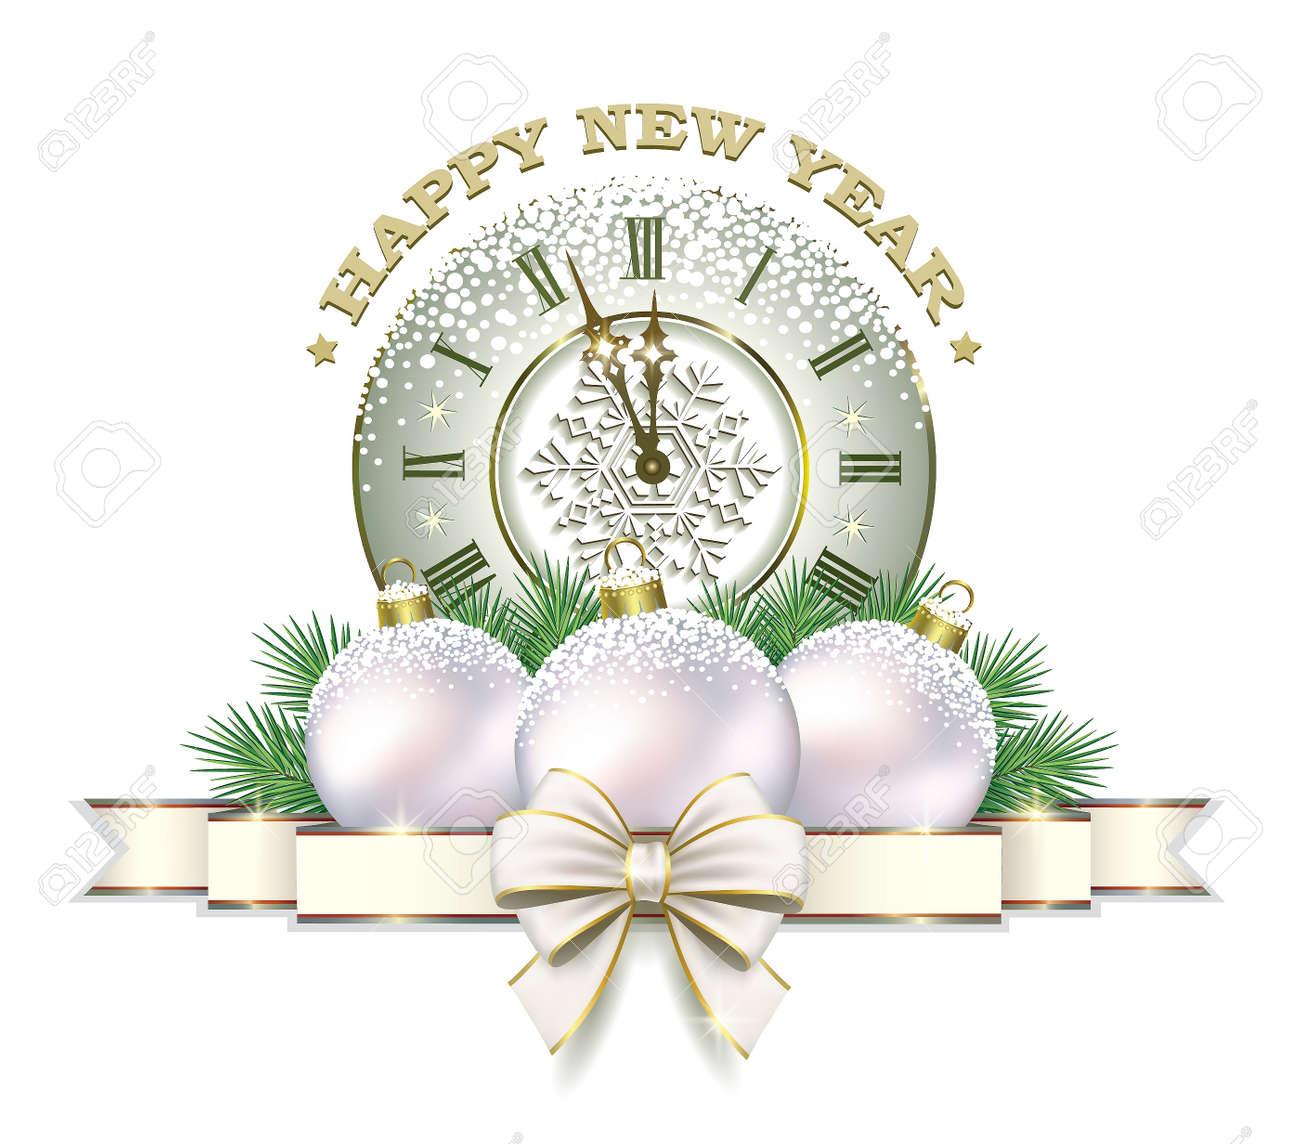 Happy New Year 2017 - 64269849